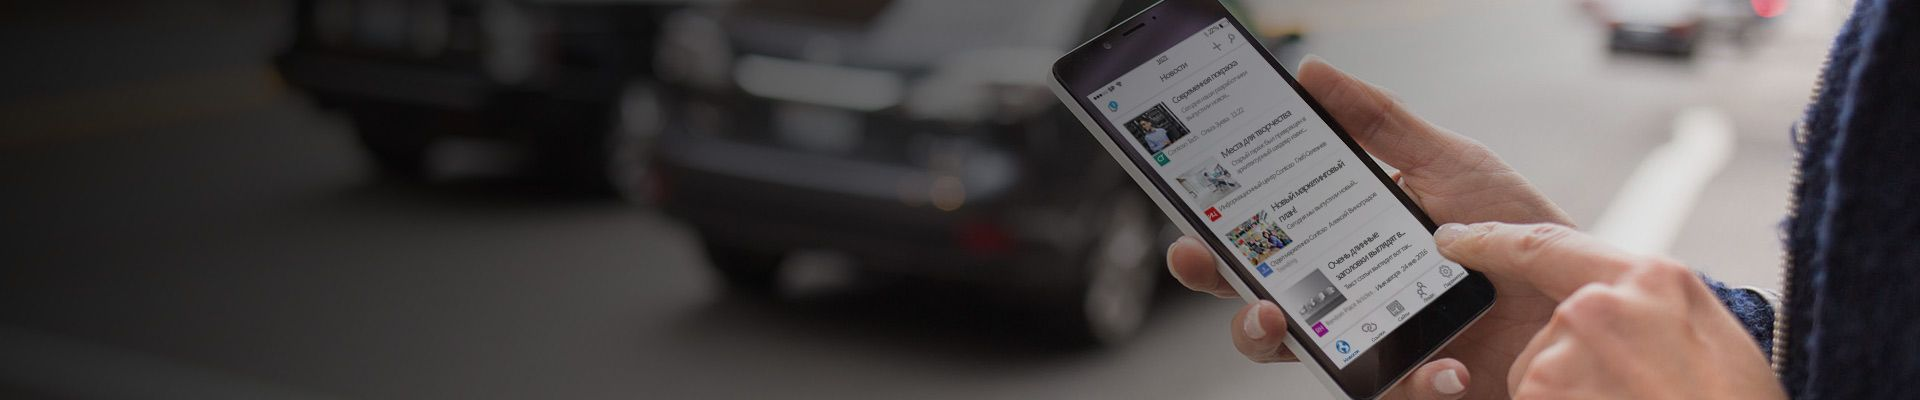 Новости сайтов в SharePoint на экране смартфона.